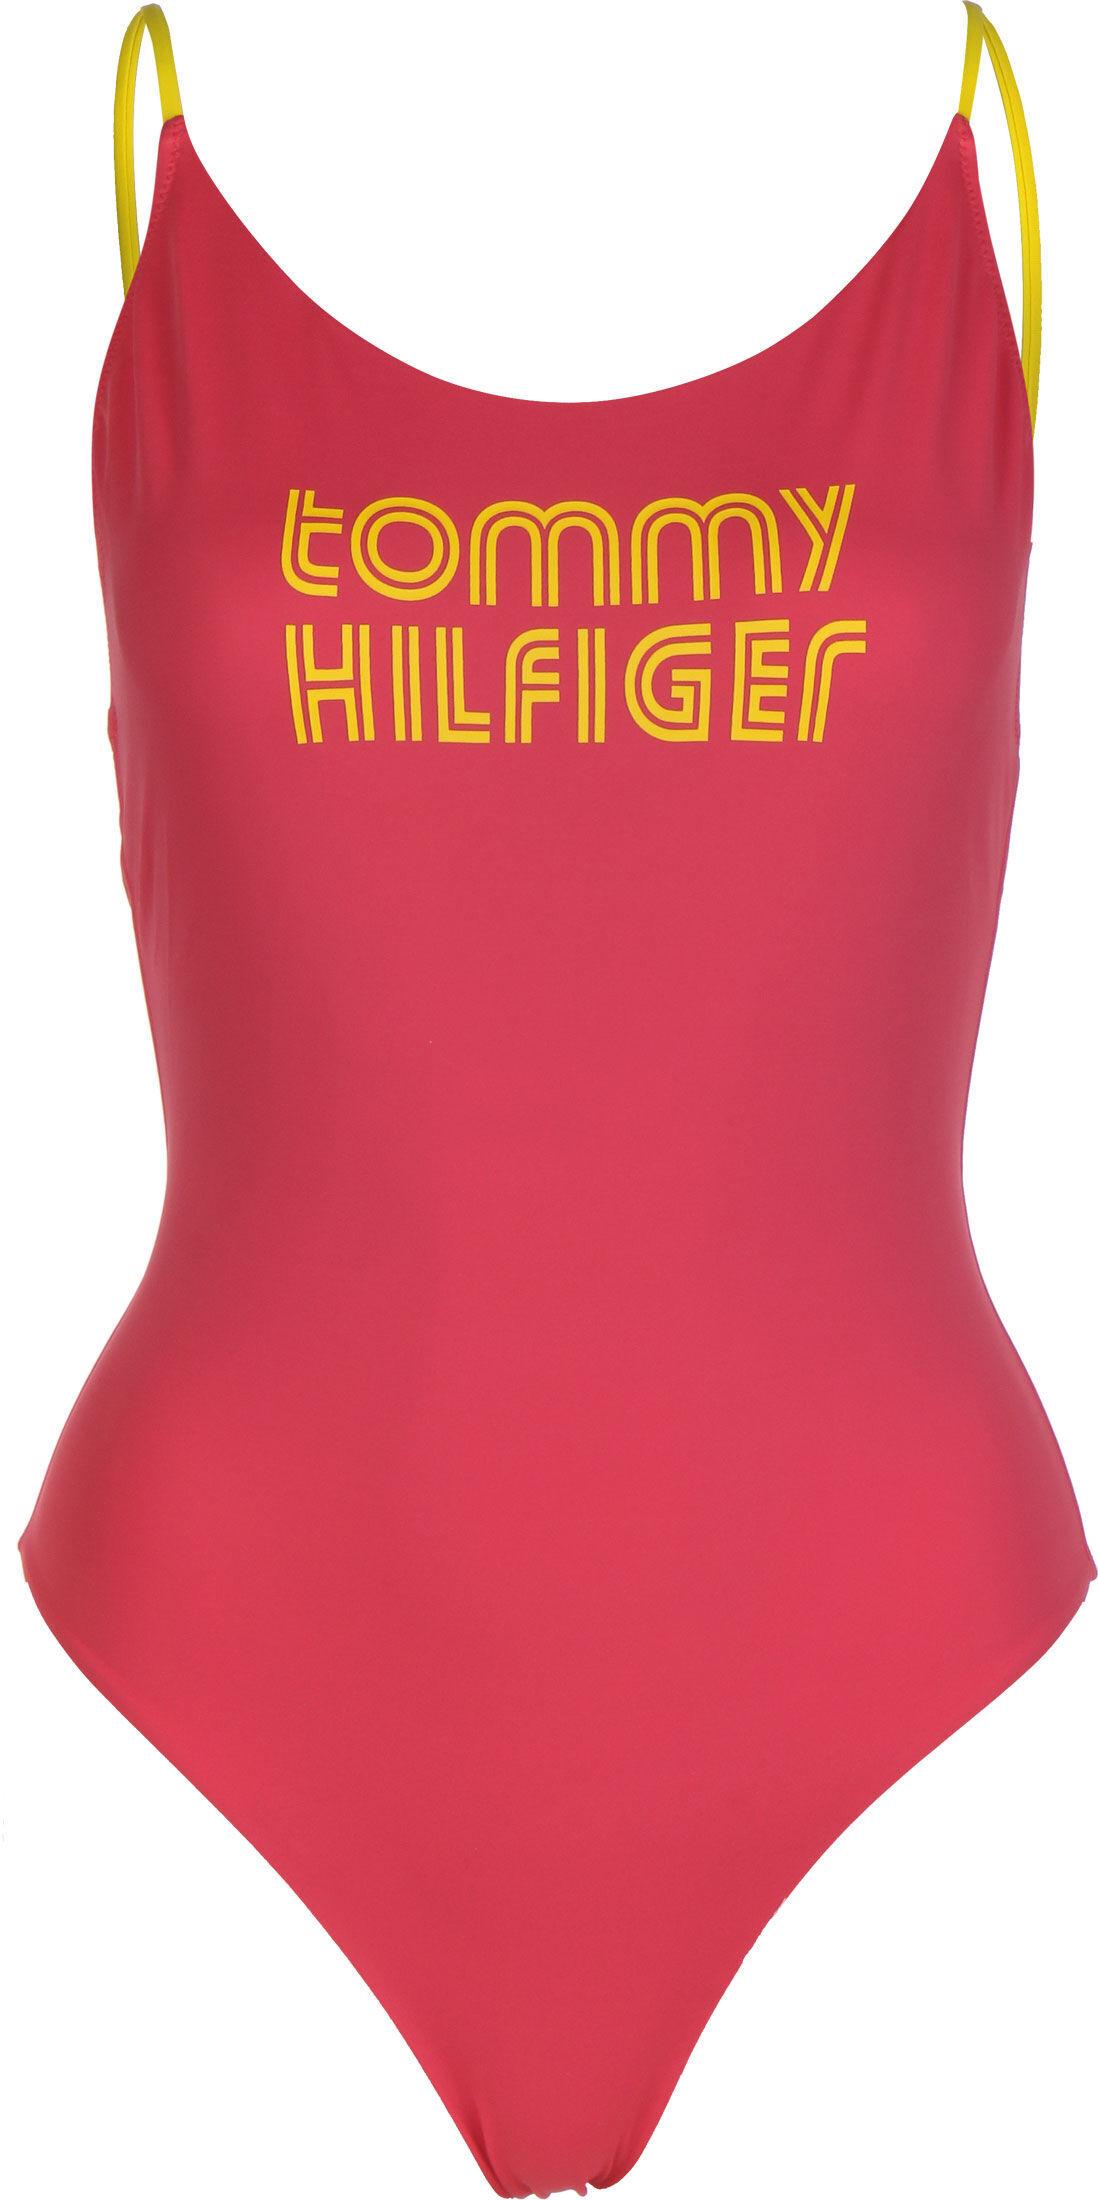 Tommy Hilfiger maillot de bain, XS, femme rose